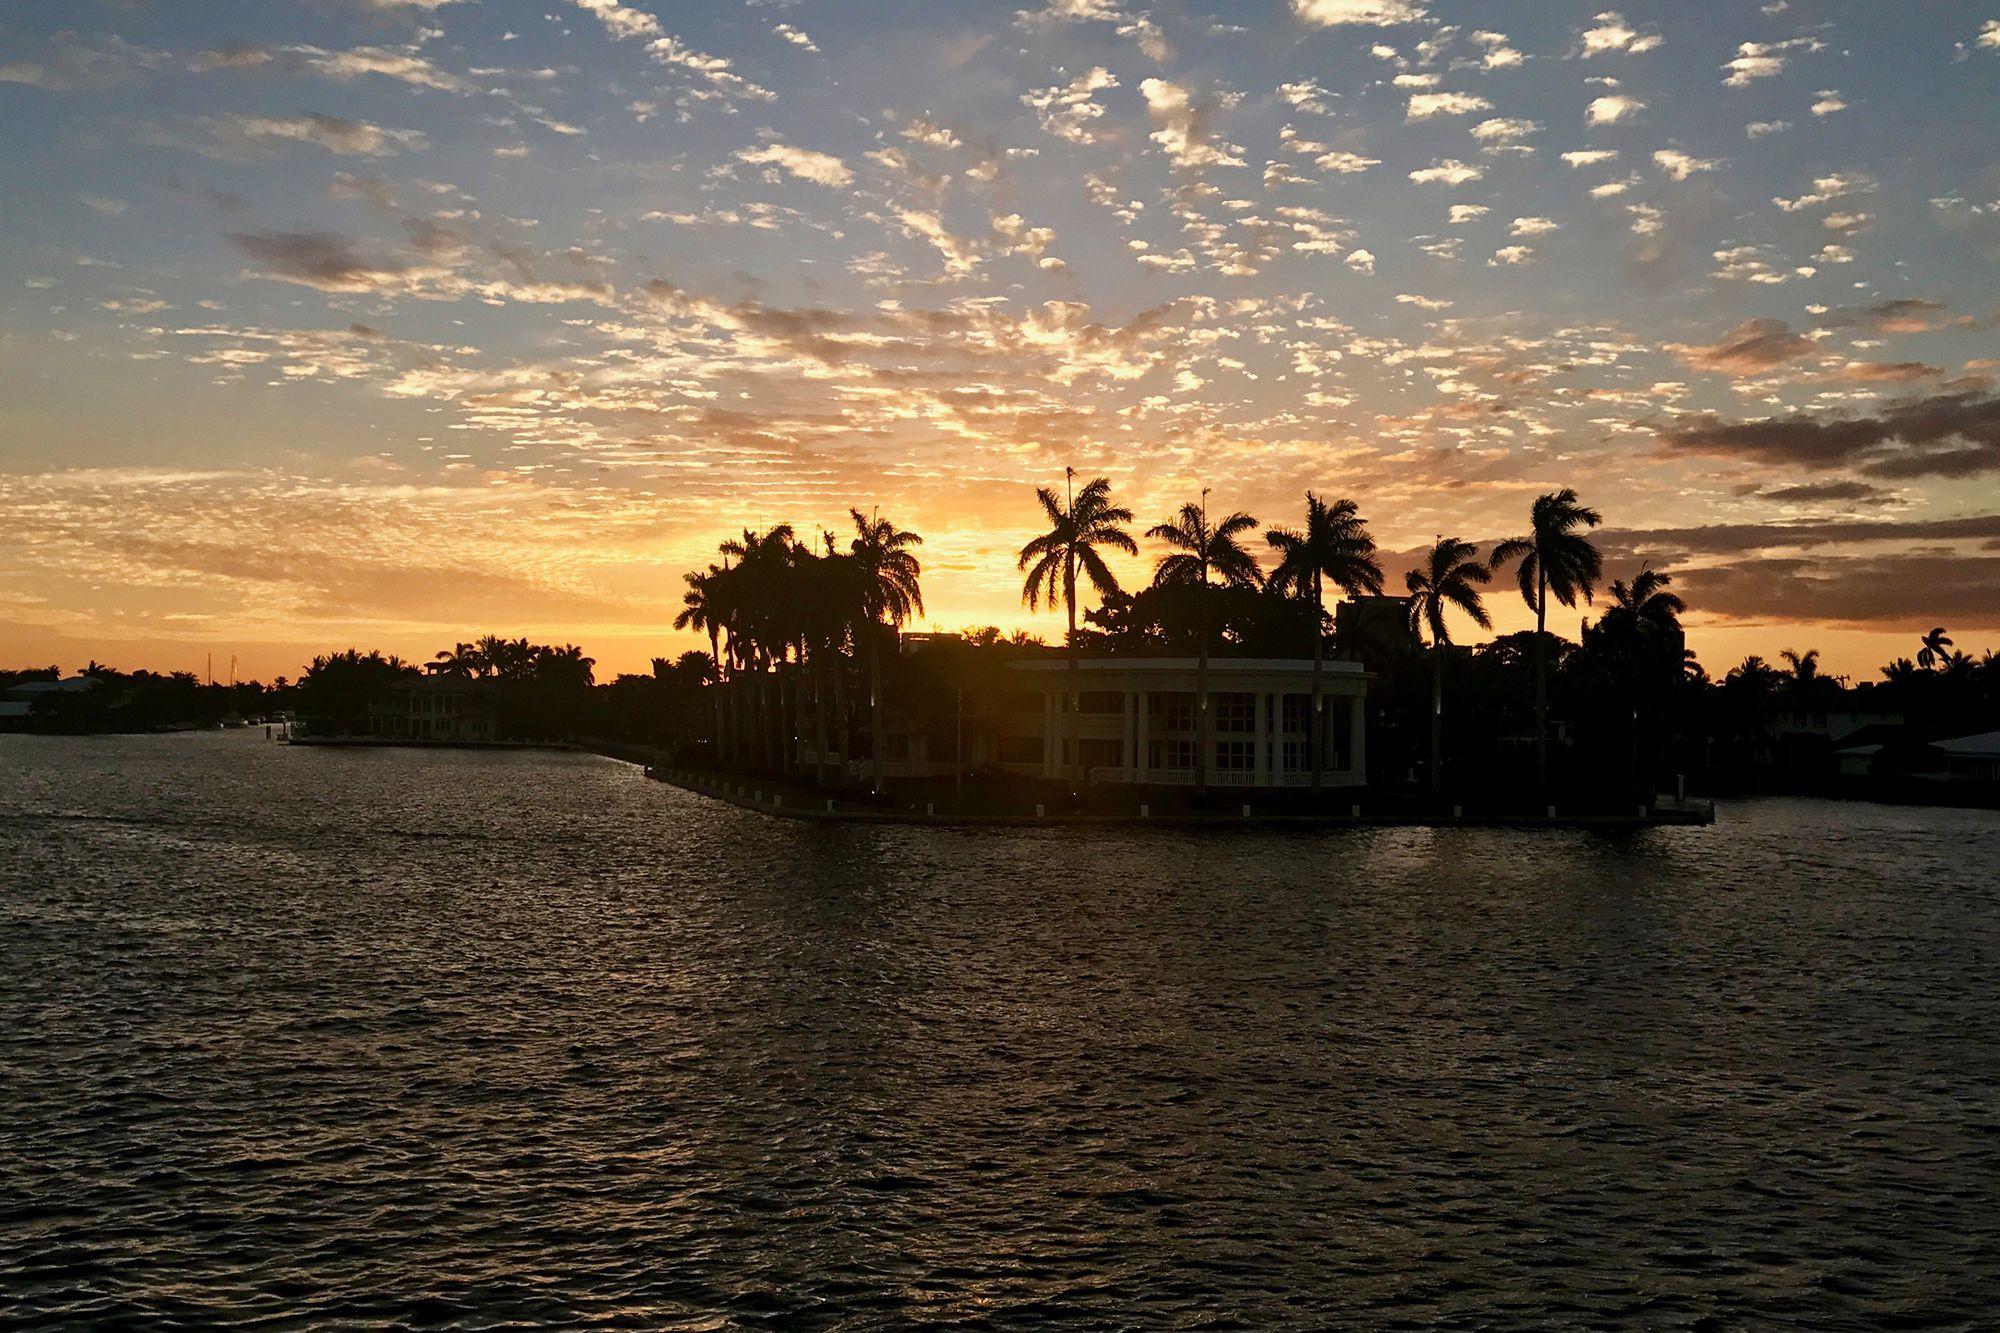 jungle-queen-amazing-mansion-sunset-views.jpg